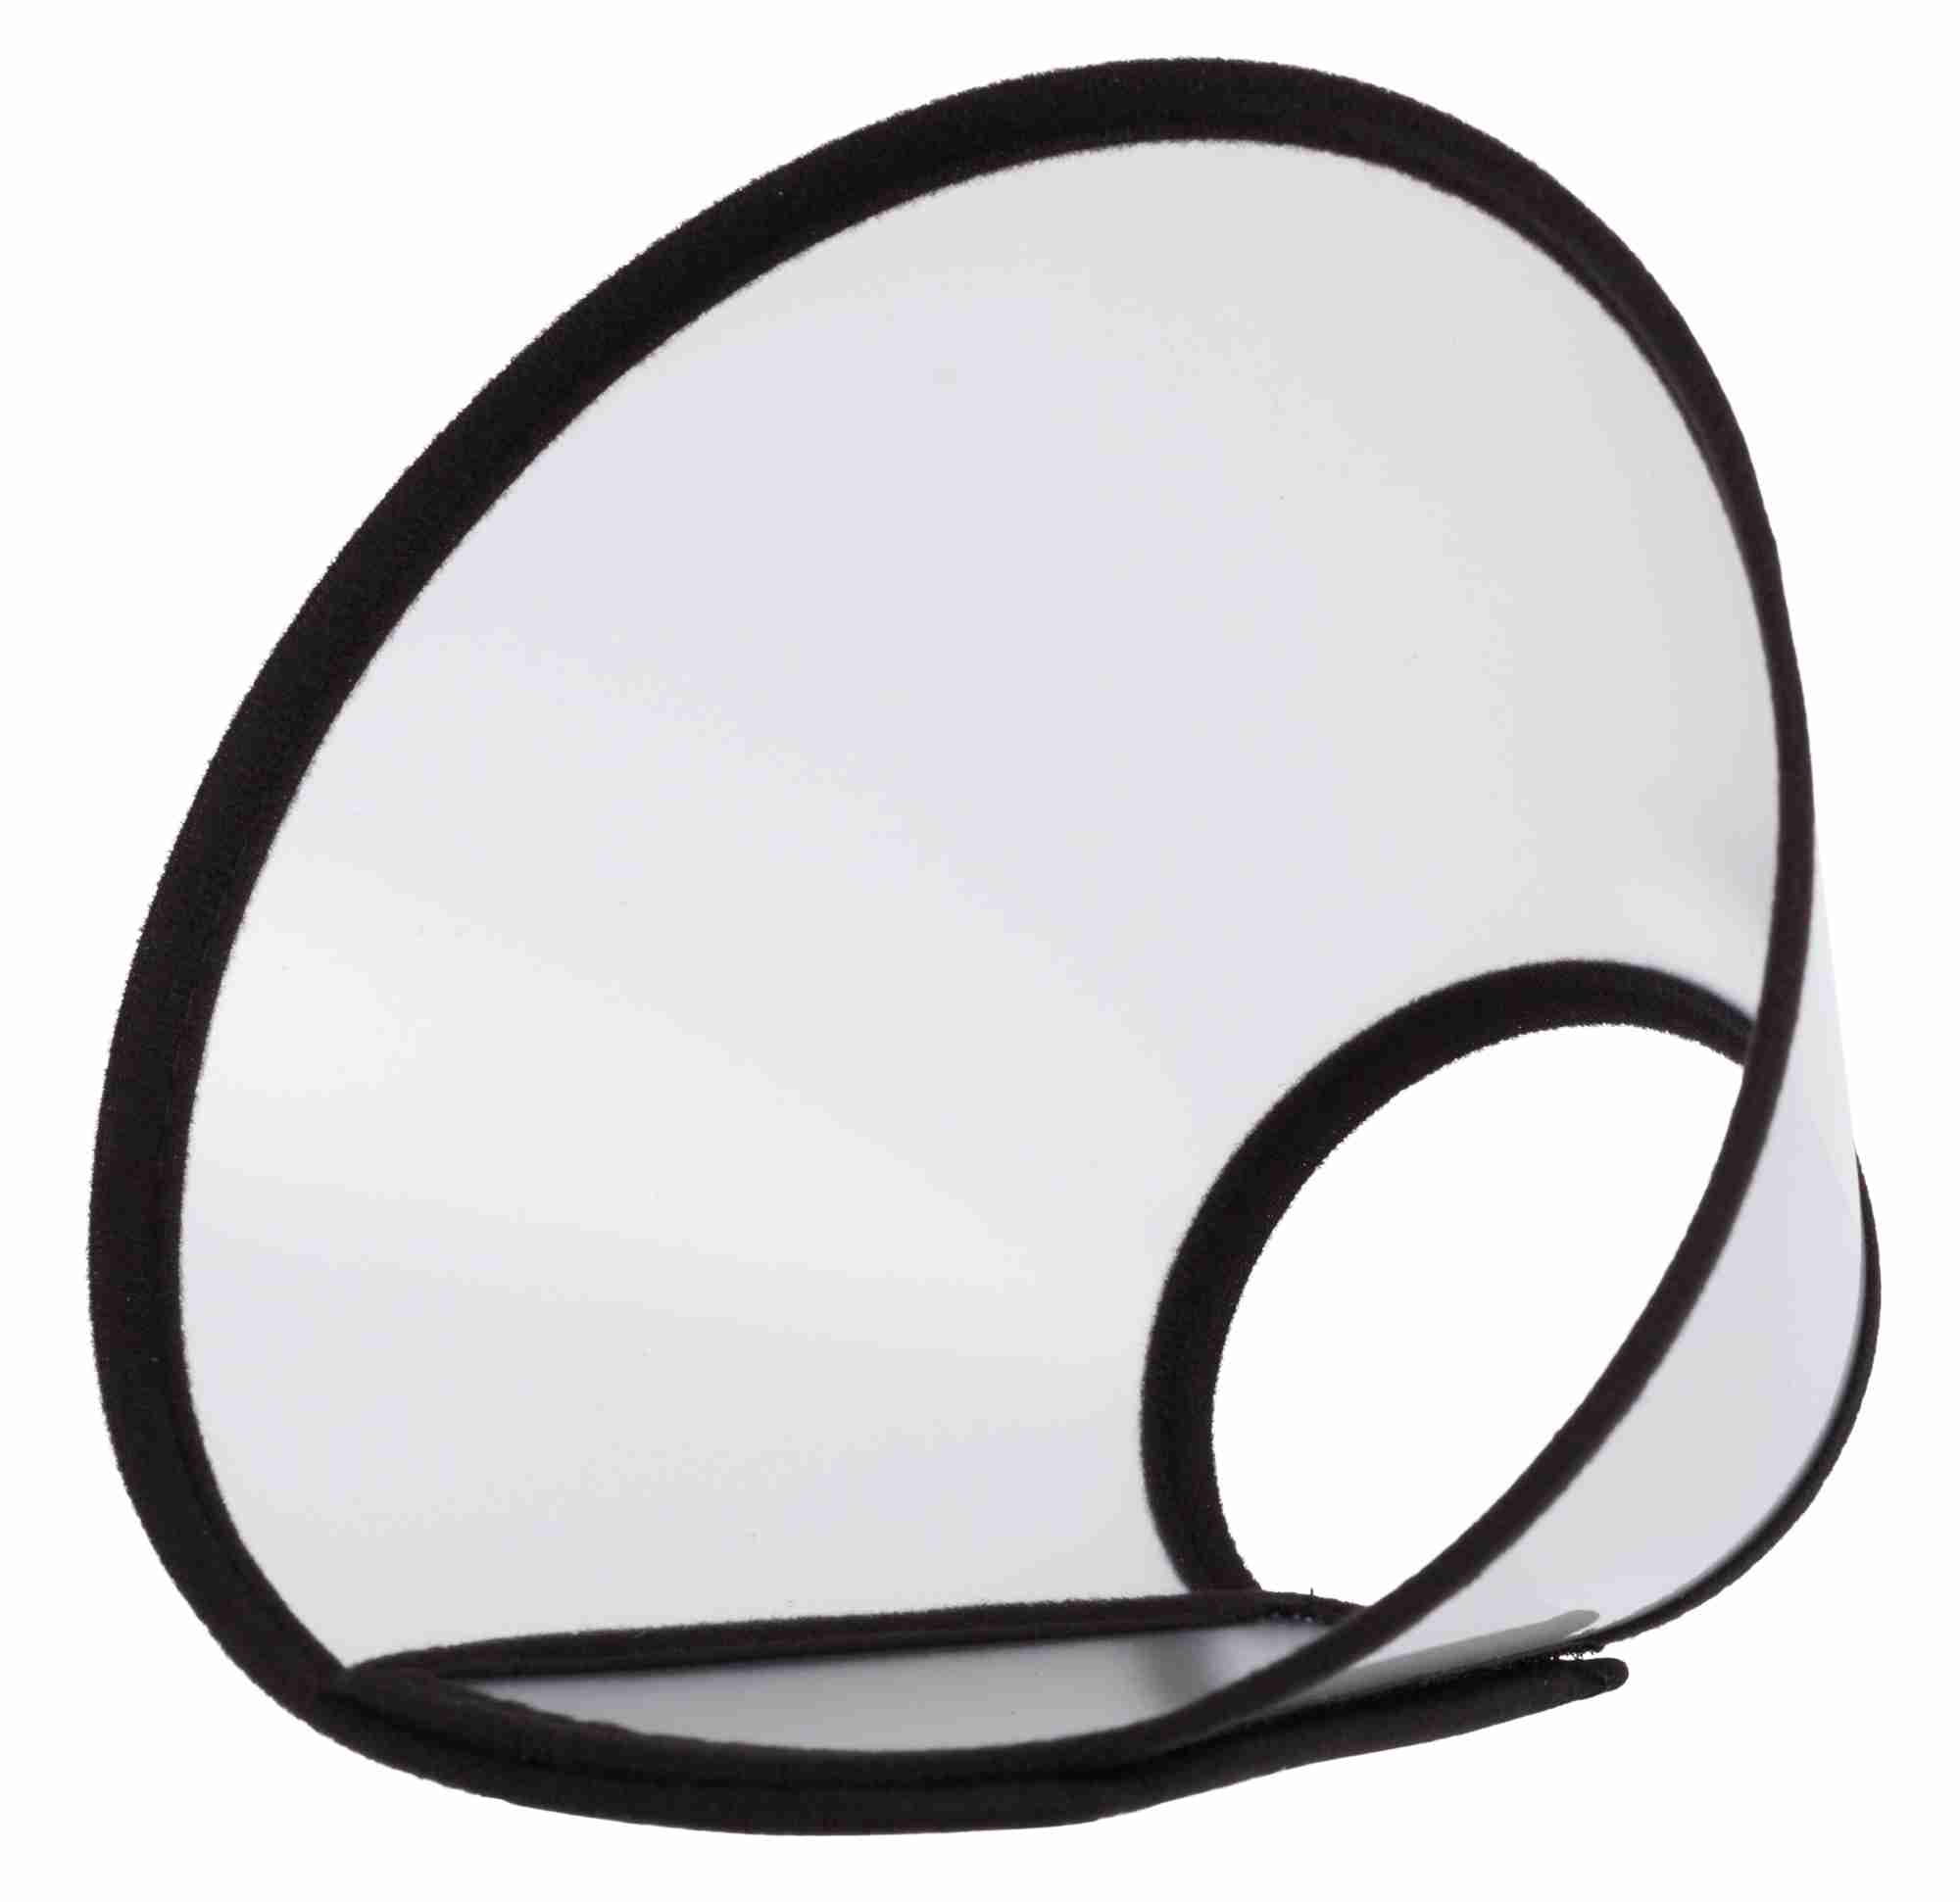 Bescherm kraag met klittenband xs 18-23cm/8cm